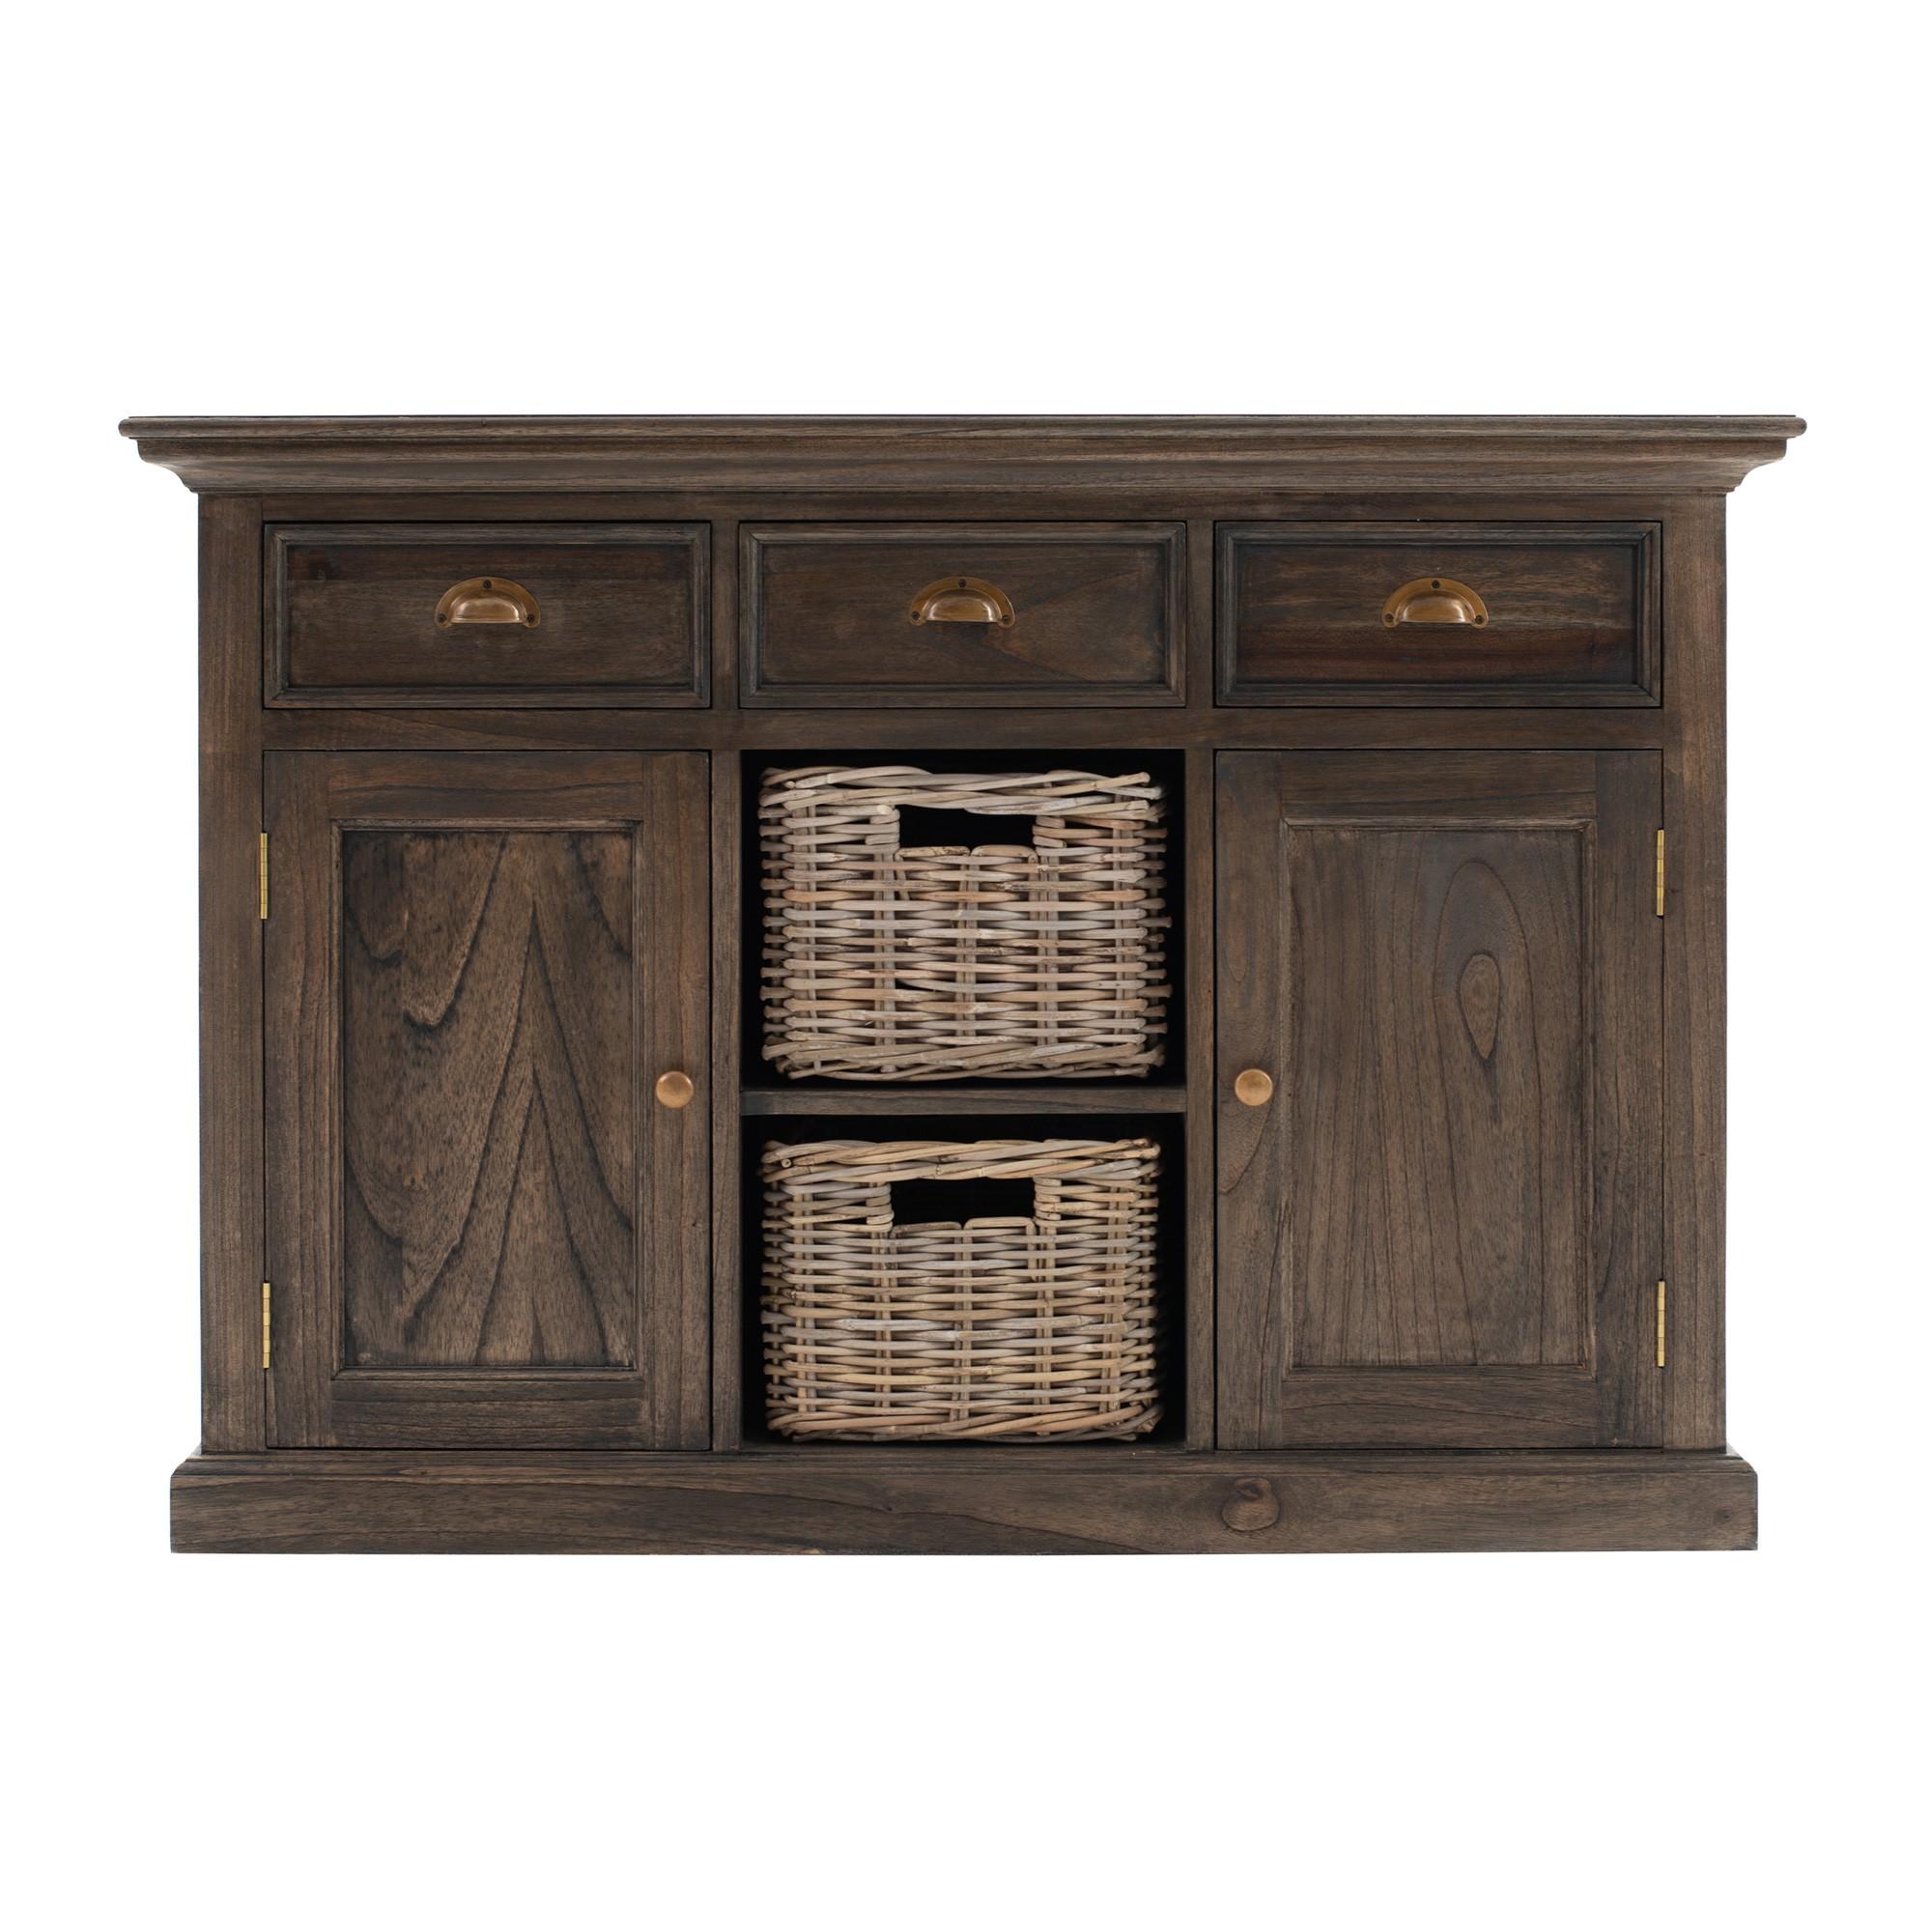 Halifax Mindi Wood 2 Door 3 Drawer Buffet Table with 2 Rattan Baskets, 125cm